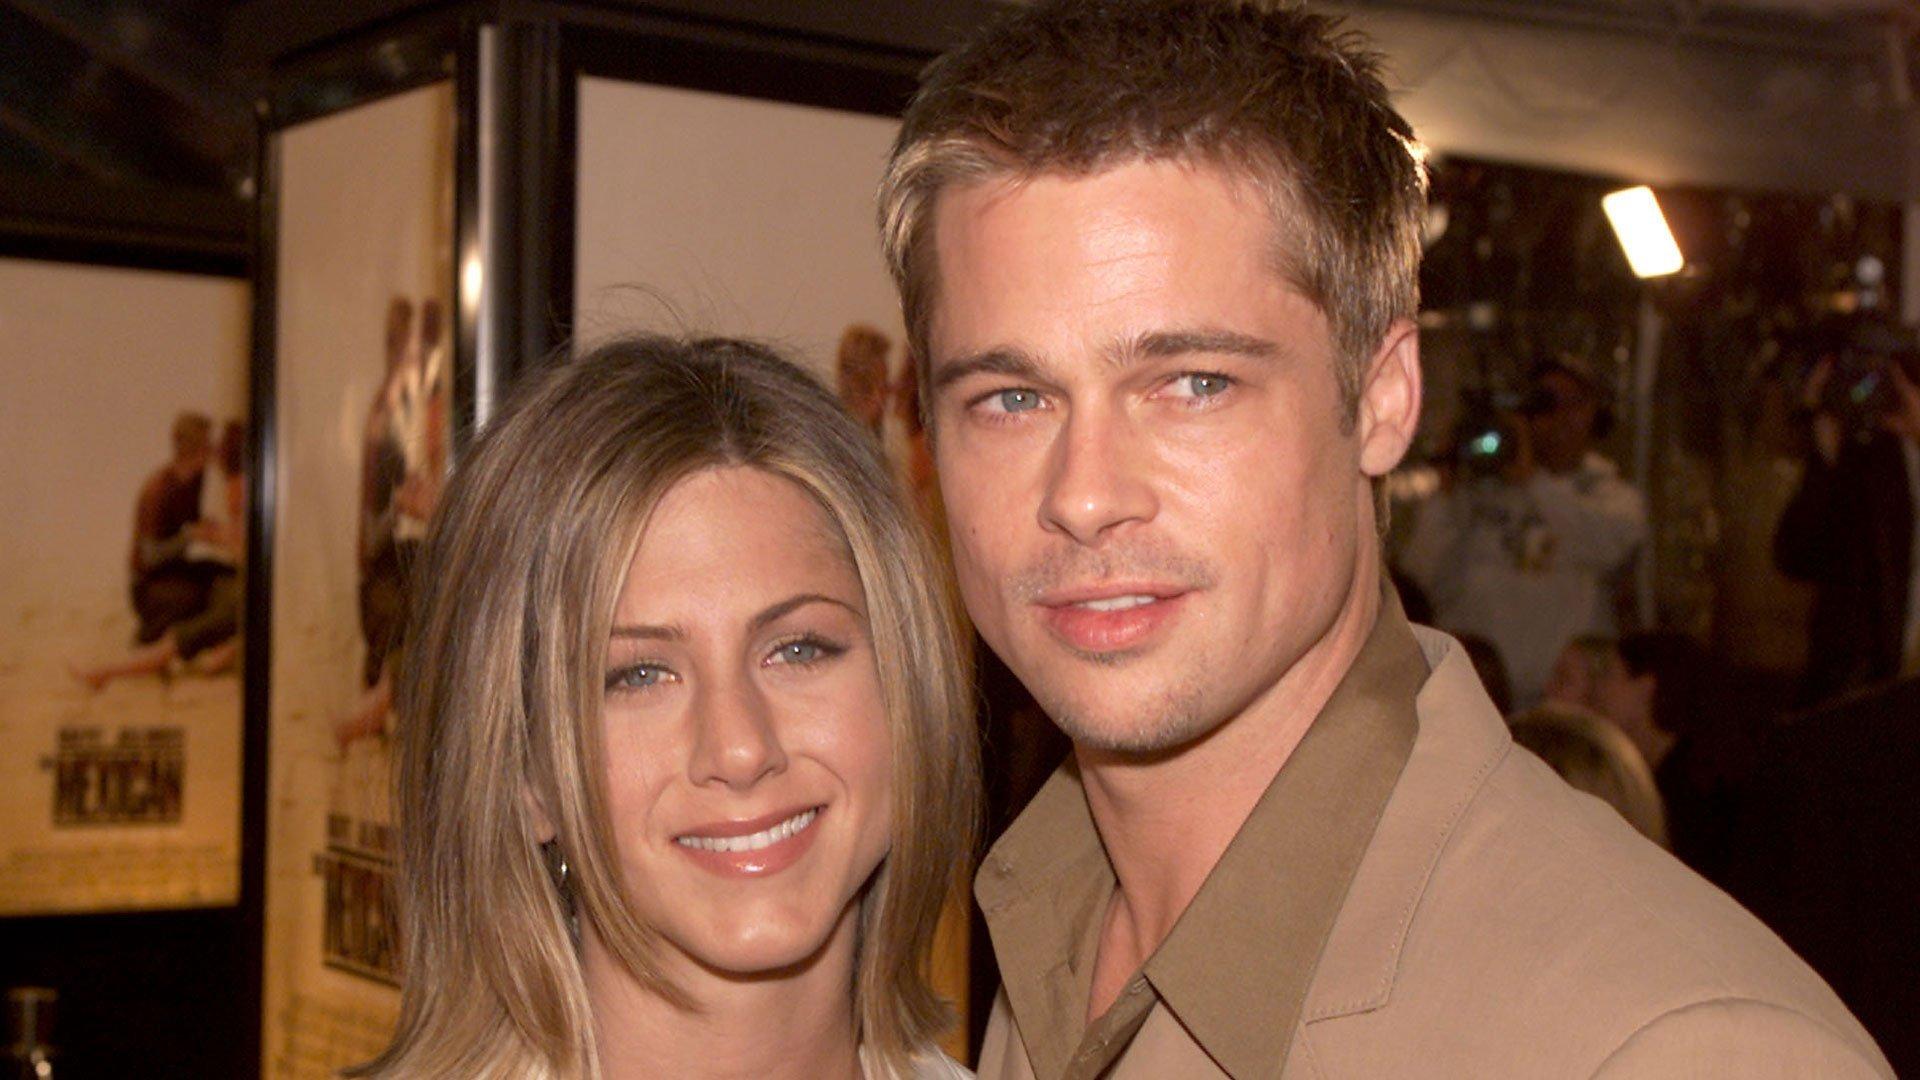 The Real Reason Brad Pitt And Jen Aniston Got Divorced